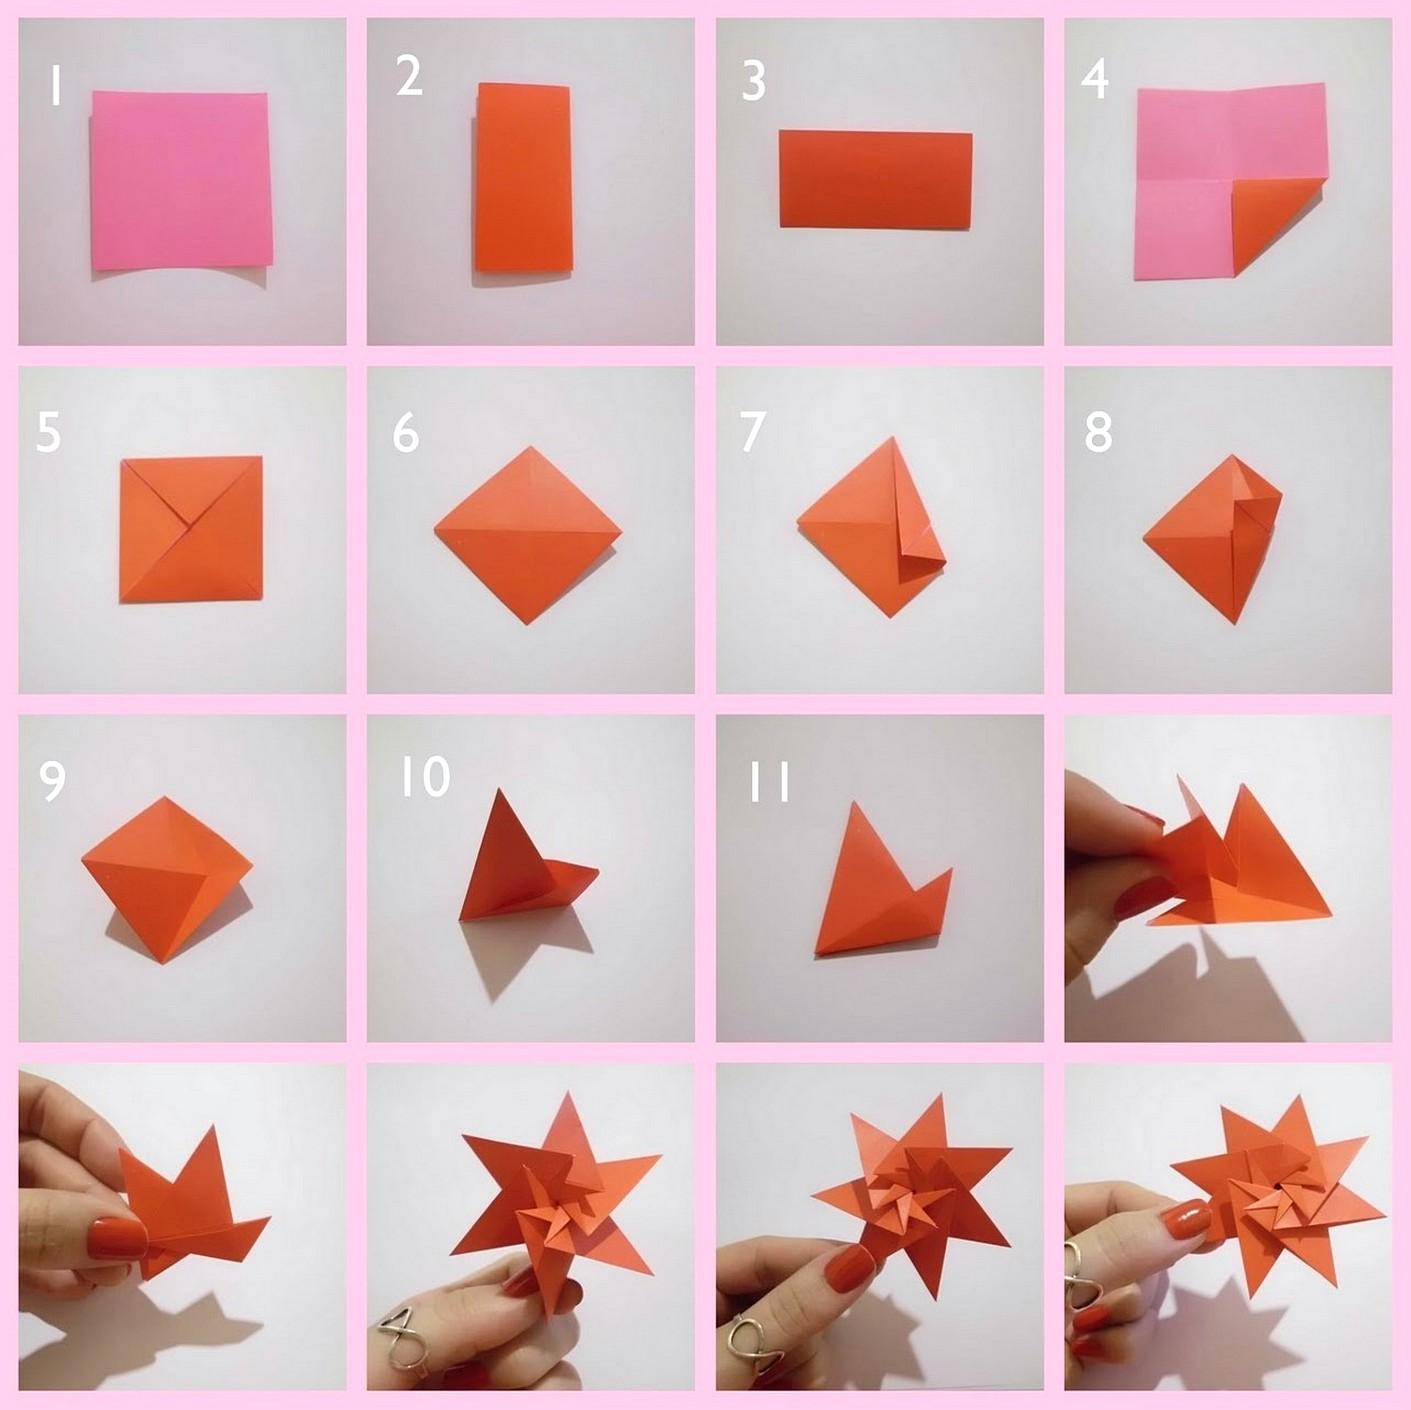 Cara Bikin Hiasan Kamar Dari Kertas Origami Ideku Unik